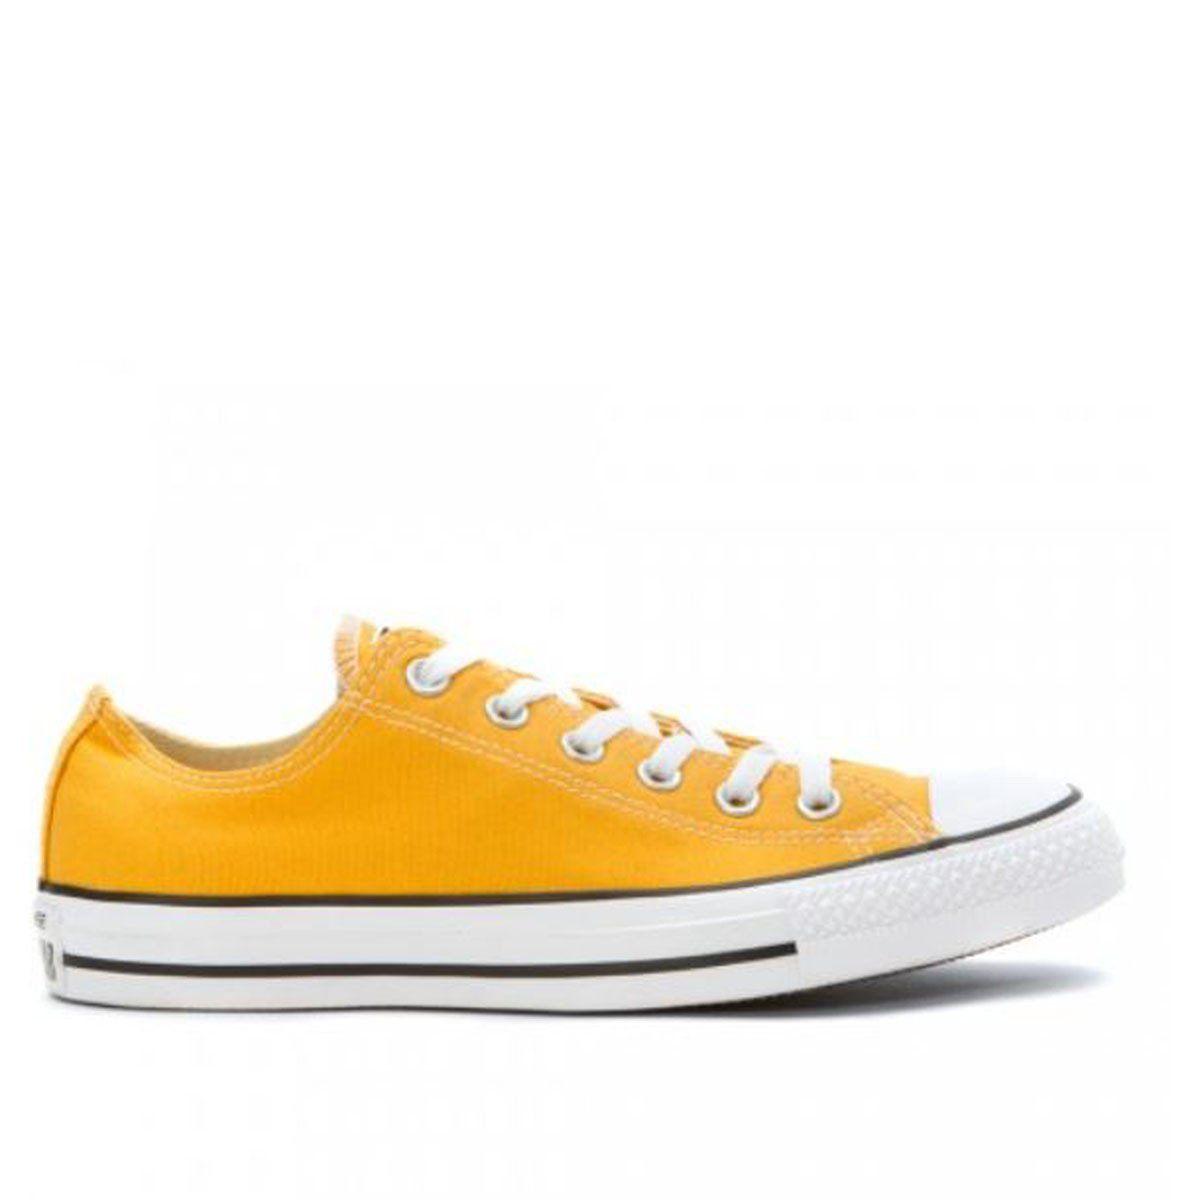 Converse Chuck Taylor Seasonal- Low-top Solar Orange Sneaker in 2019 ... 0bdce316e